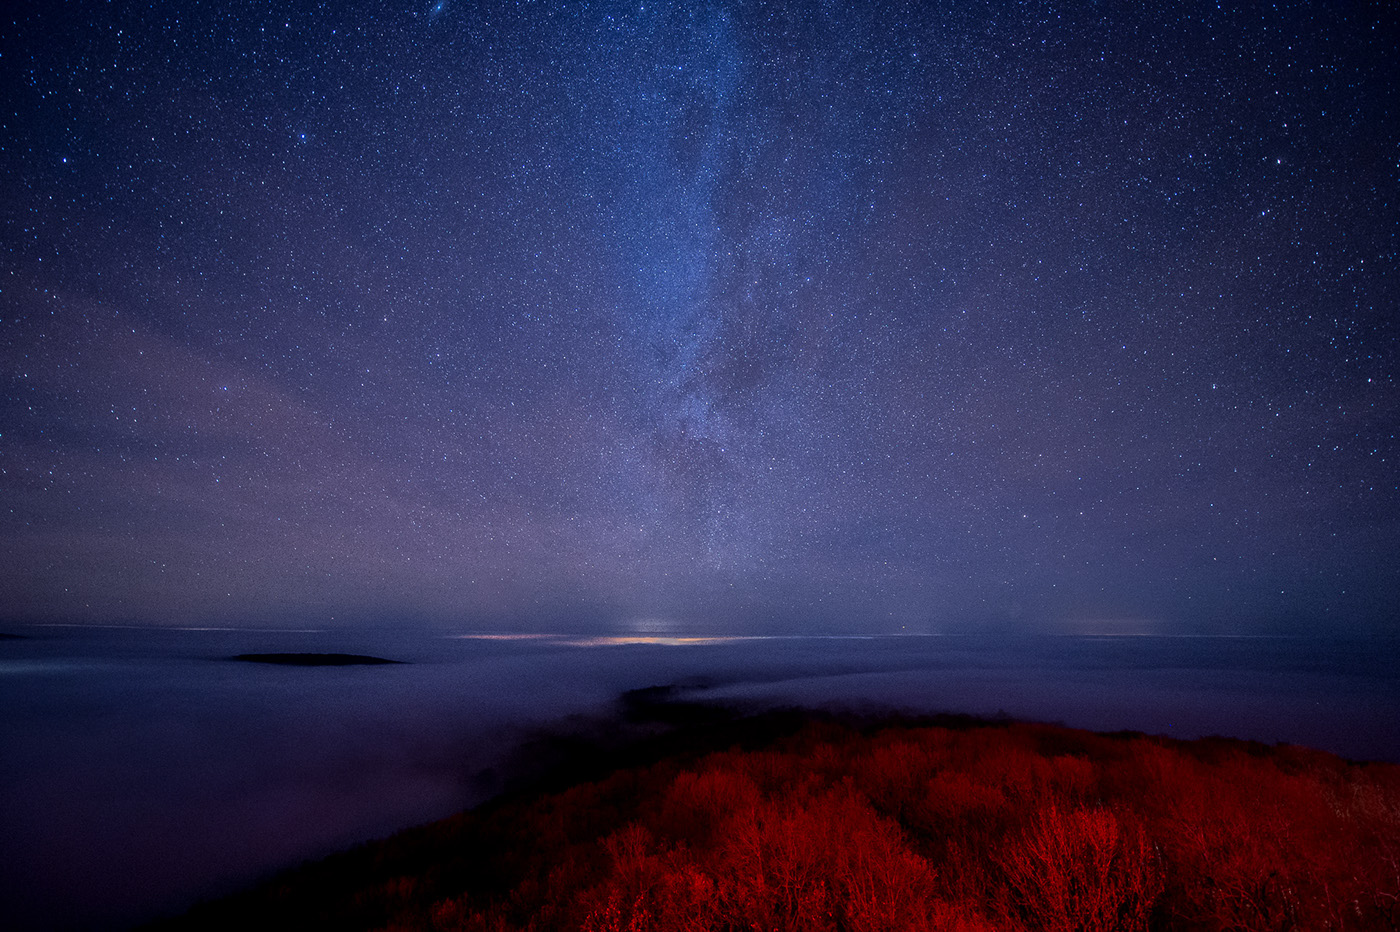 fog,mountain,stars,night,transmissiontower,hungary,tower,SKY